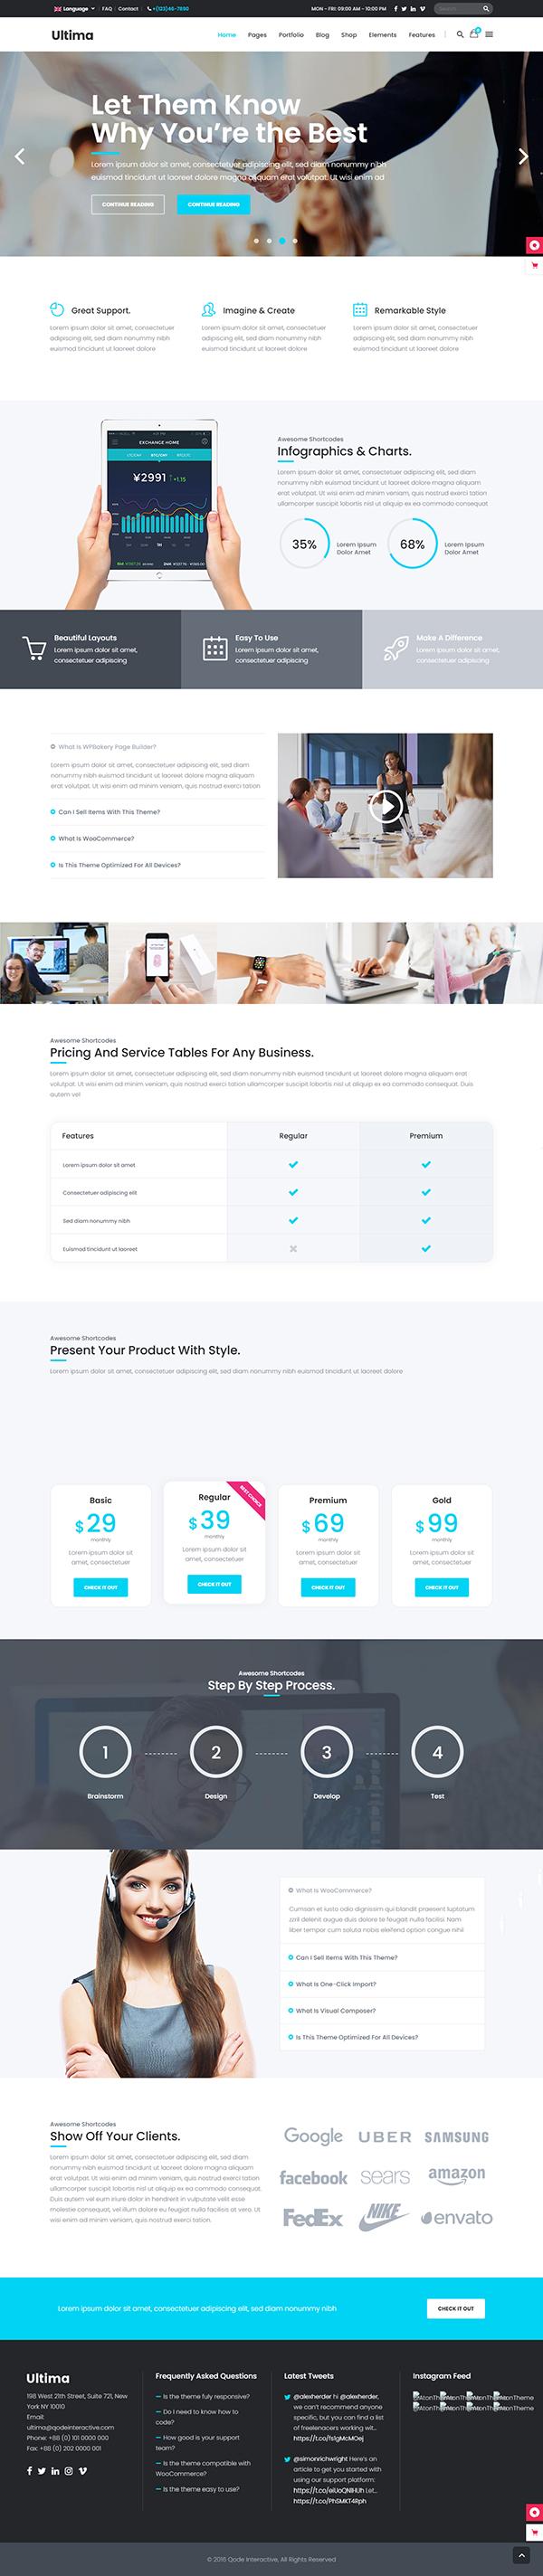 Ultima - Digital Marketing Agency Theme